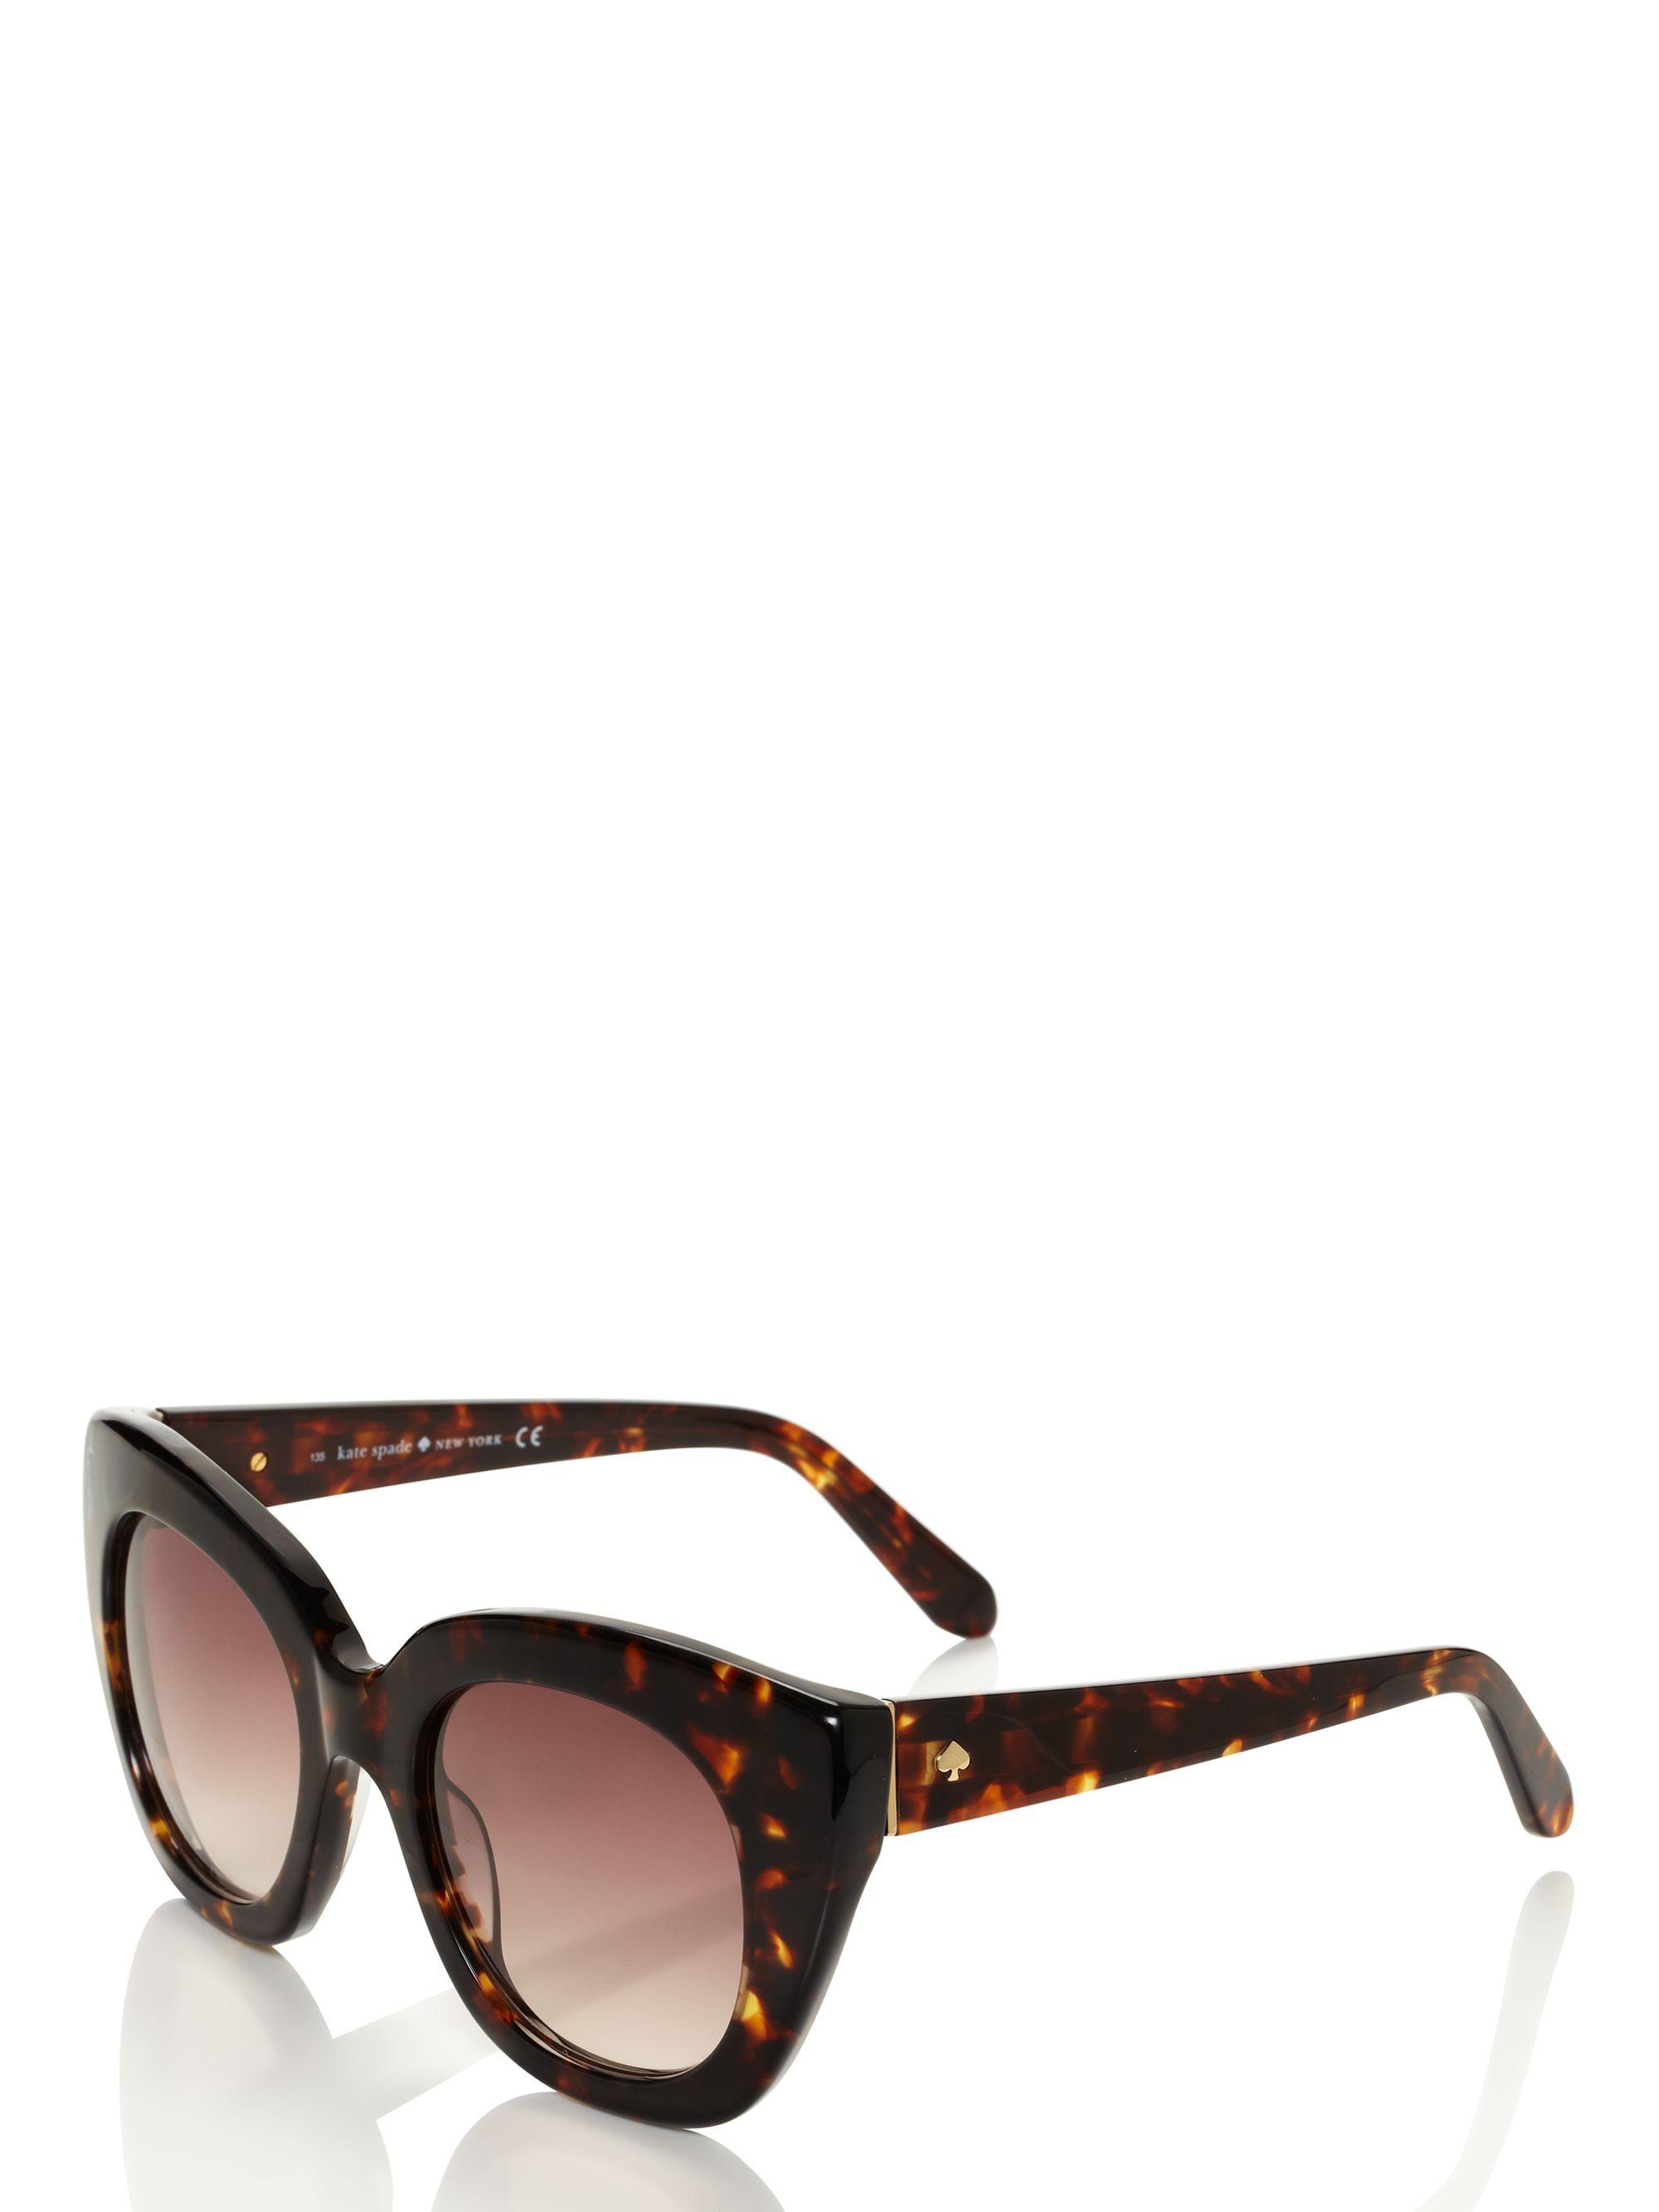 ffdfa12197c Lyst - Kate Spade Narelle Sunglasses in Brown